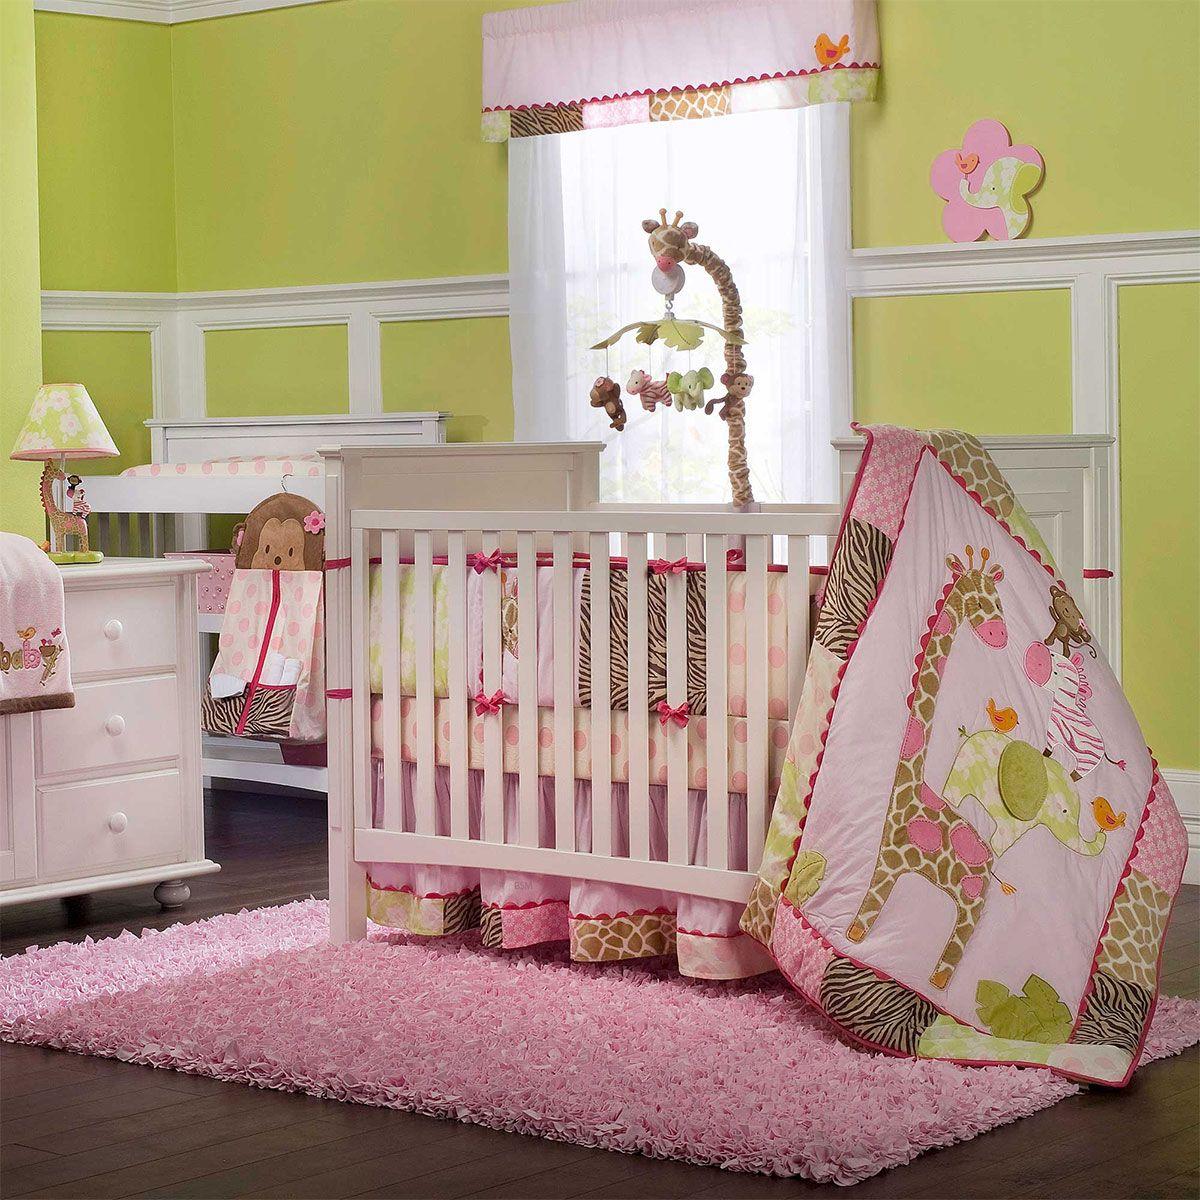 Baby crib zebra bedding - Carter S Jungle Jill 4 Piece Crib Bedding Set